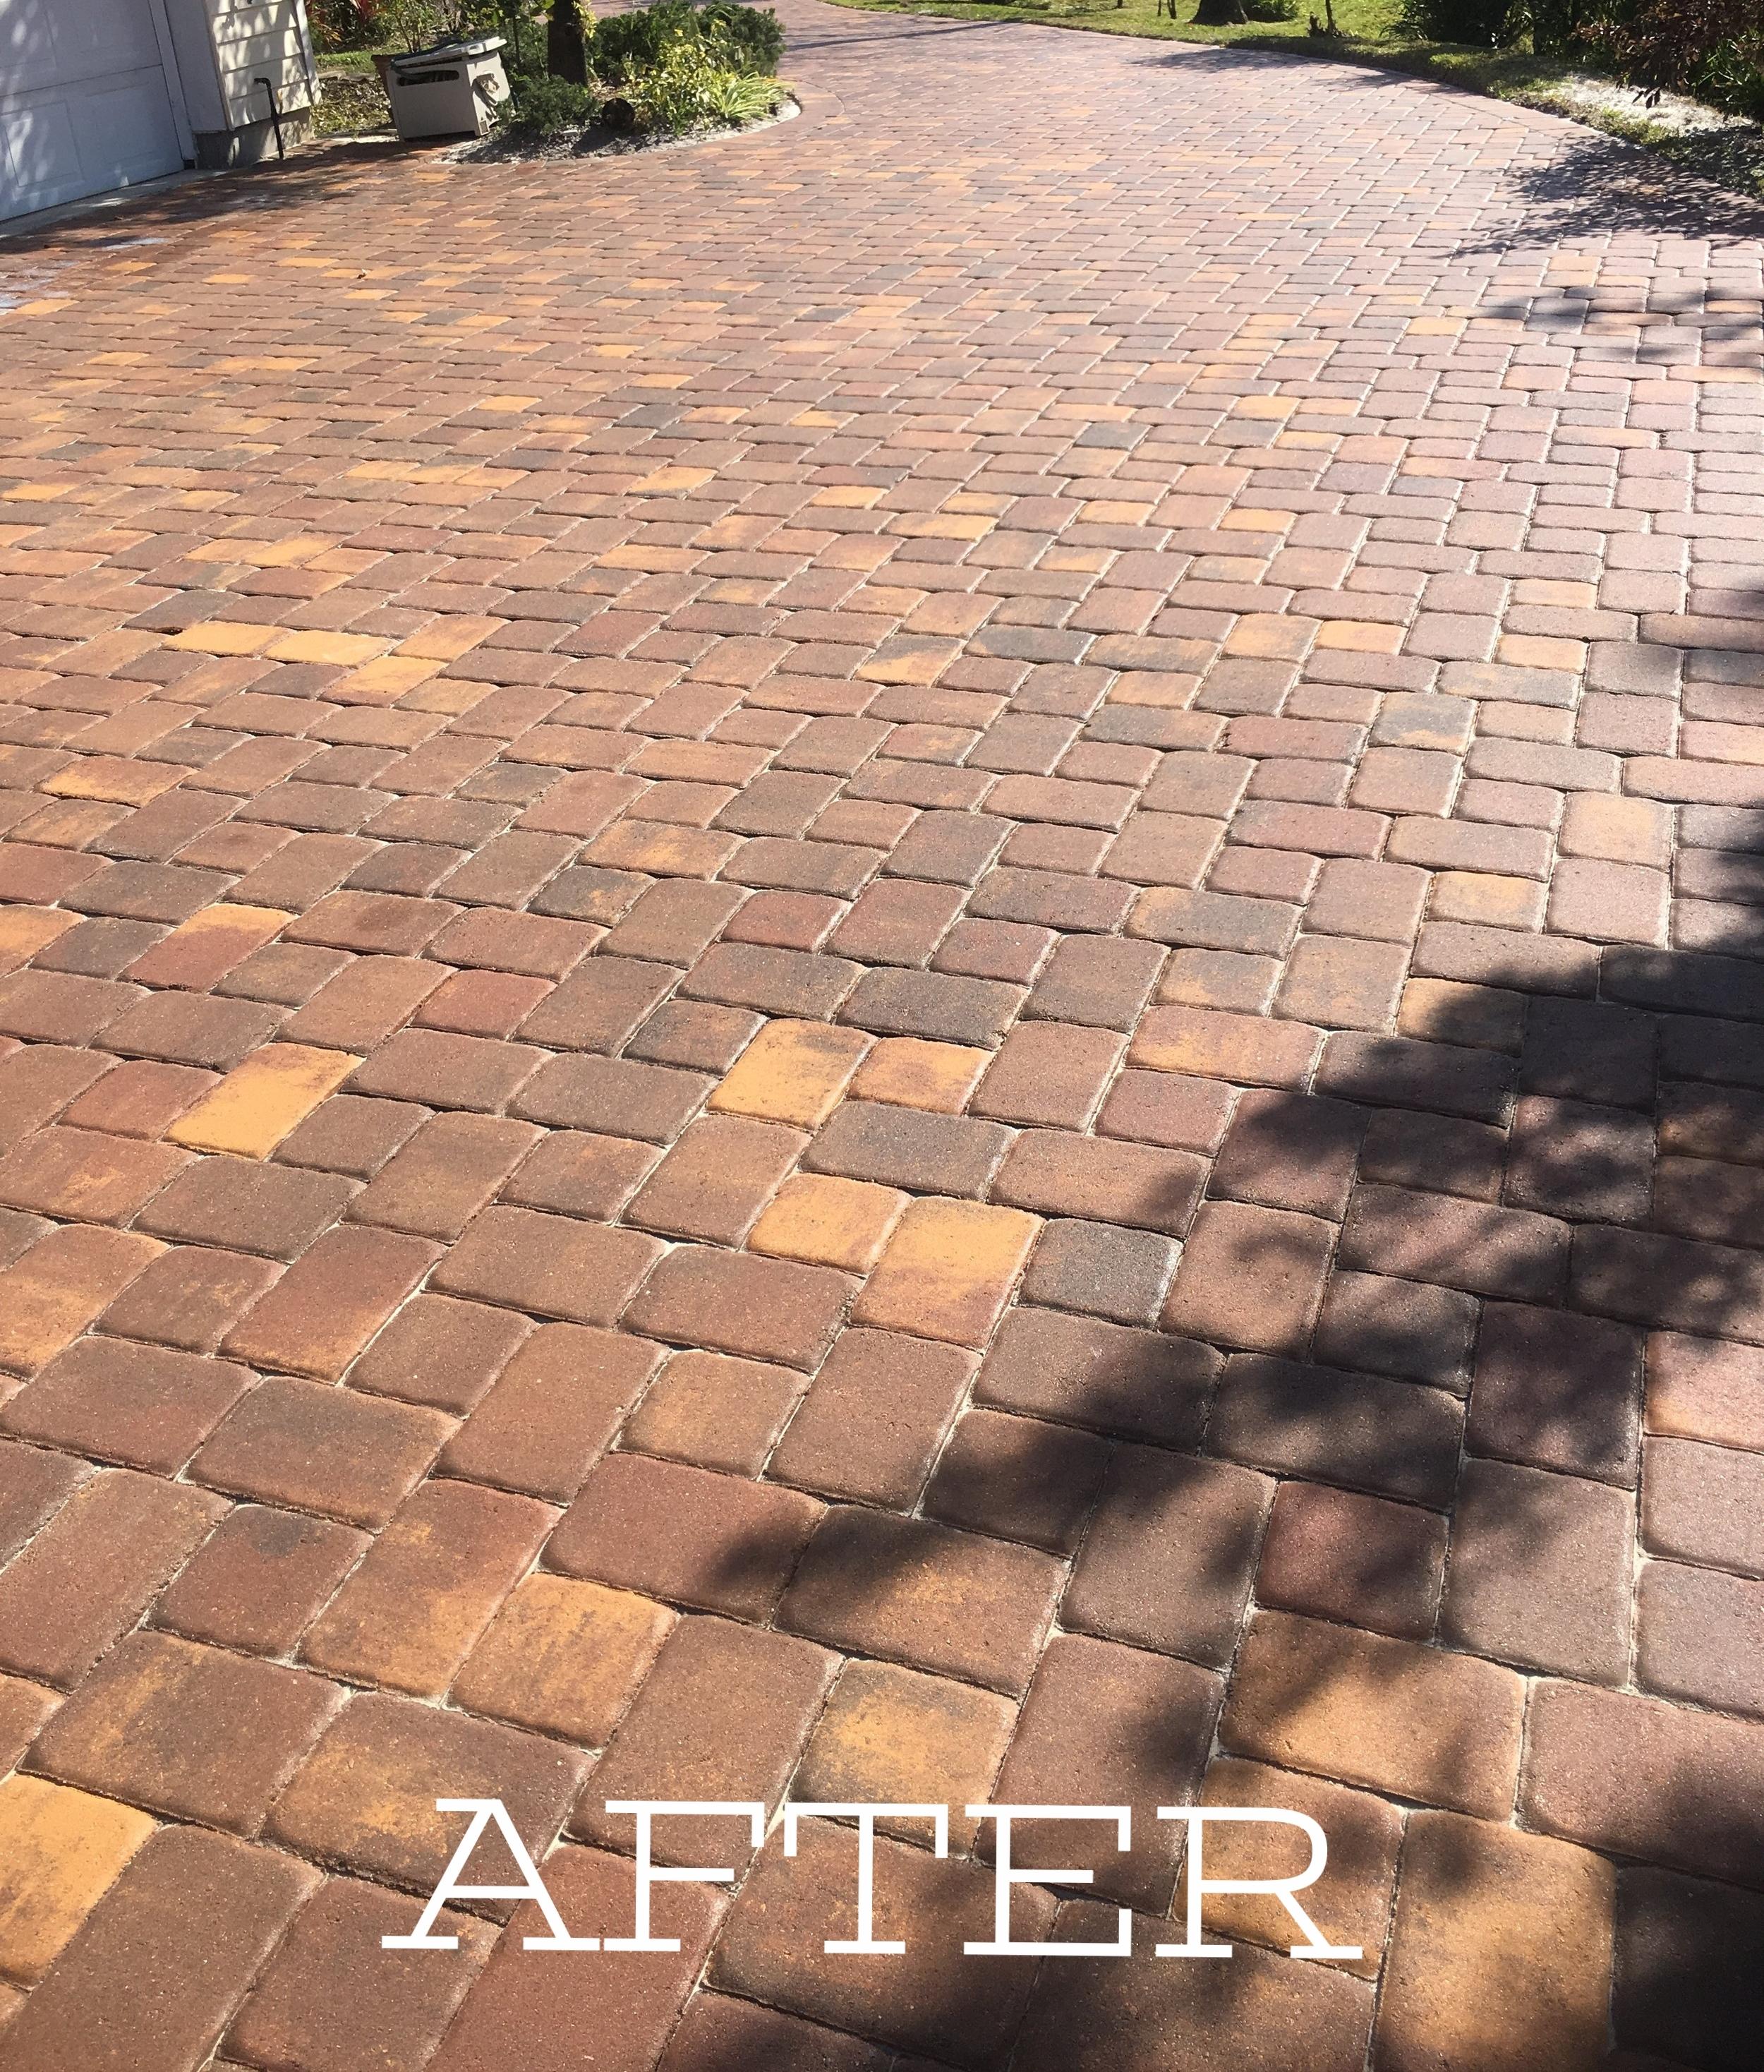 Sealed paver driveway in Melbourne FL